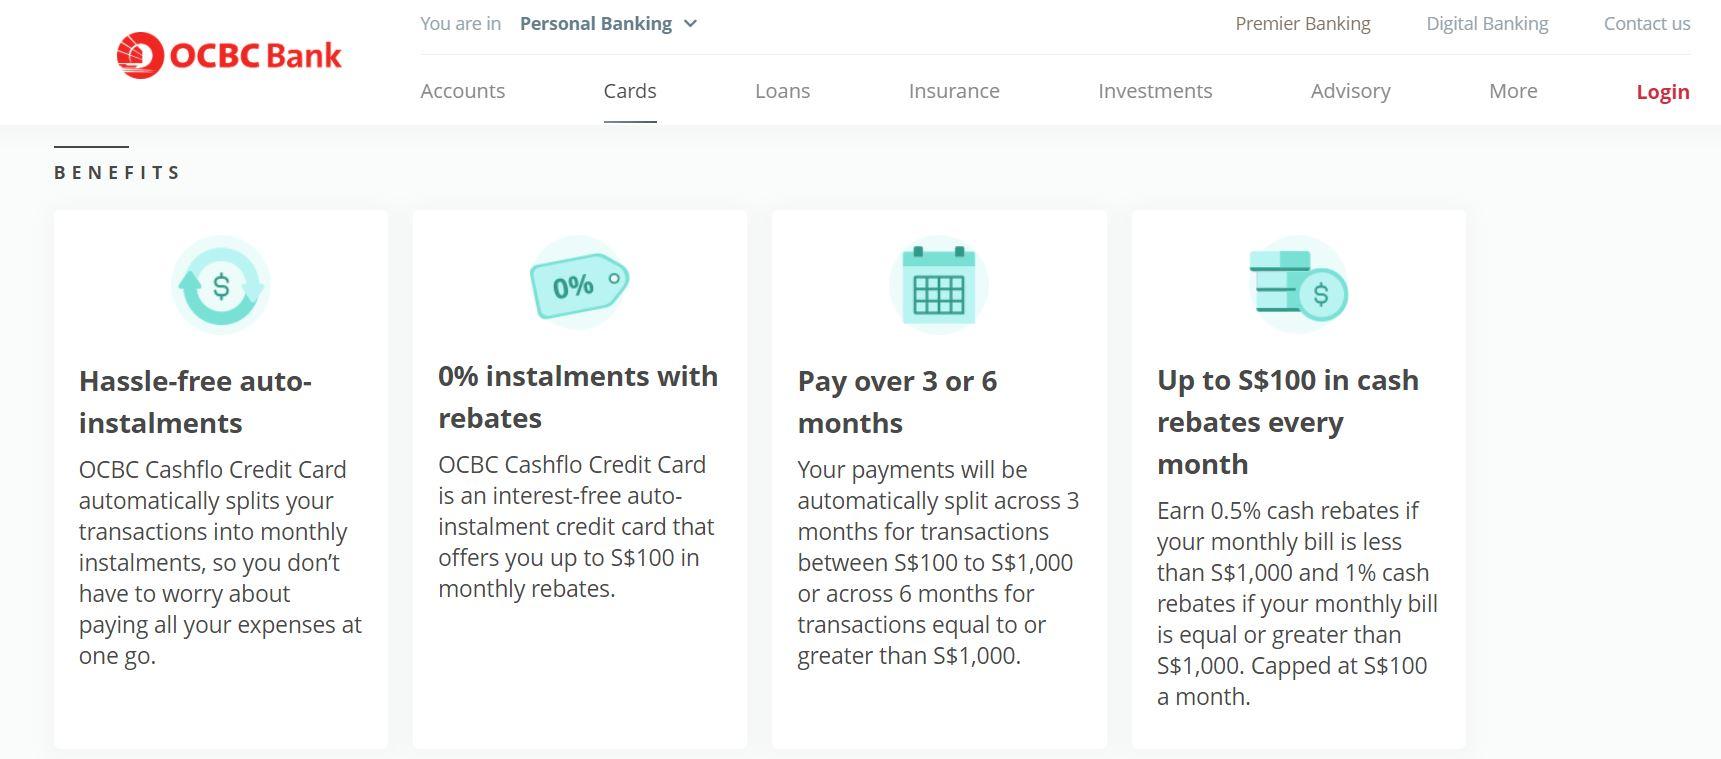 OCBC Cashflo Credit Card Pre-October 2020